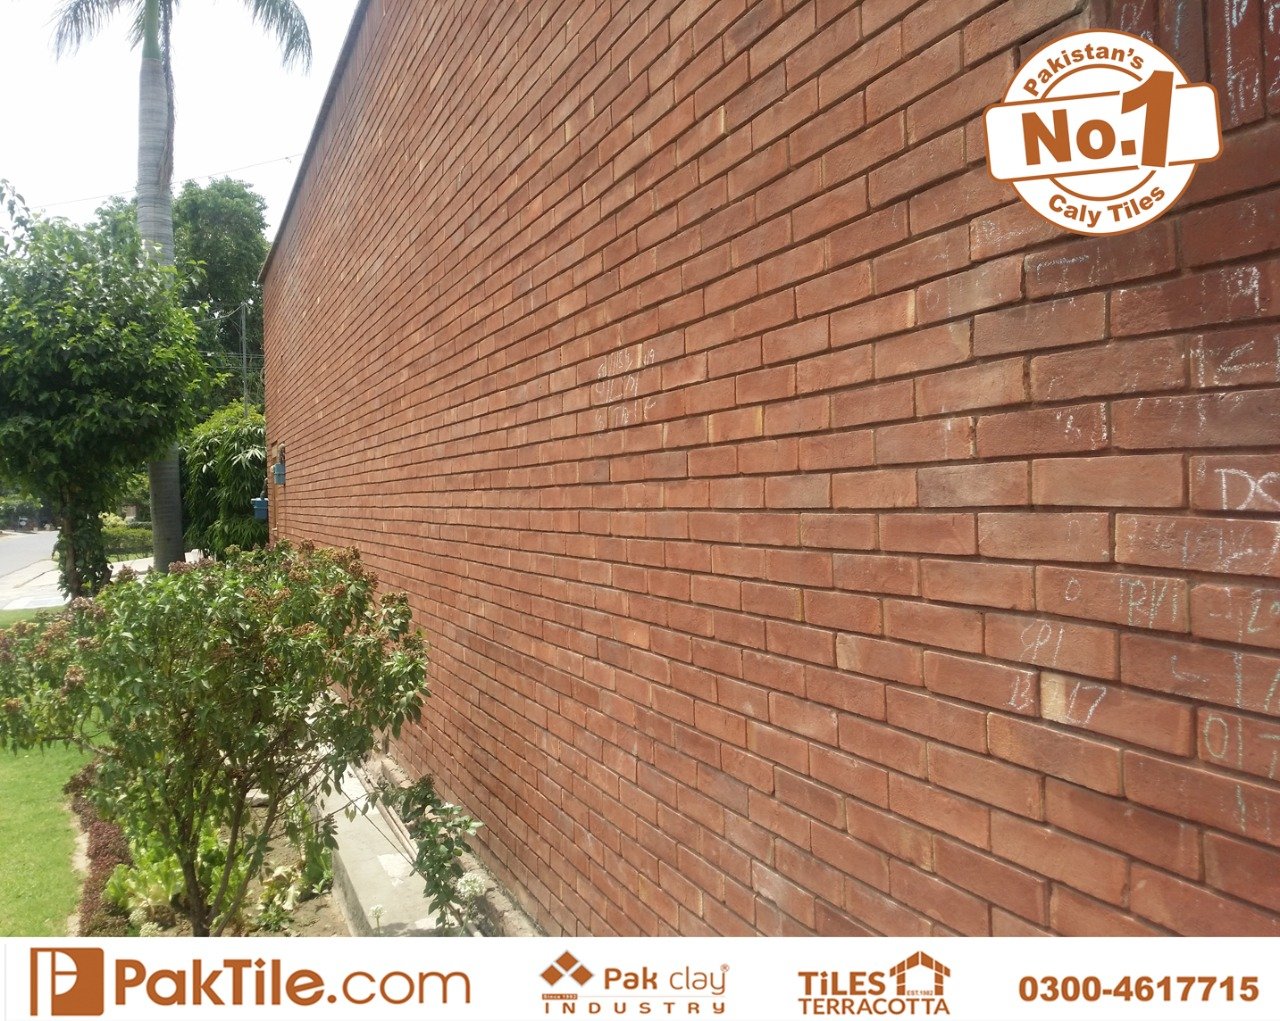 gutka bricks price in islamabad